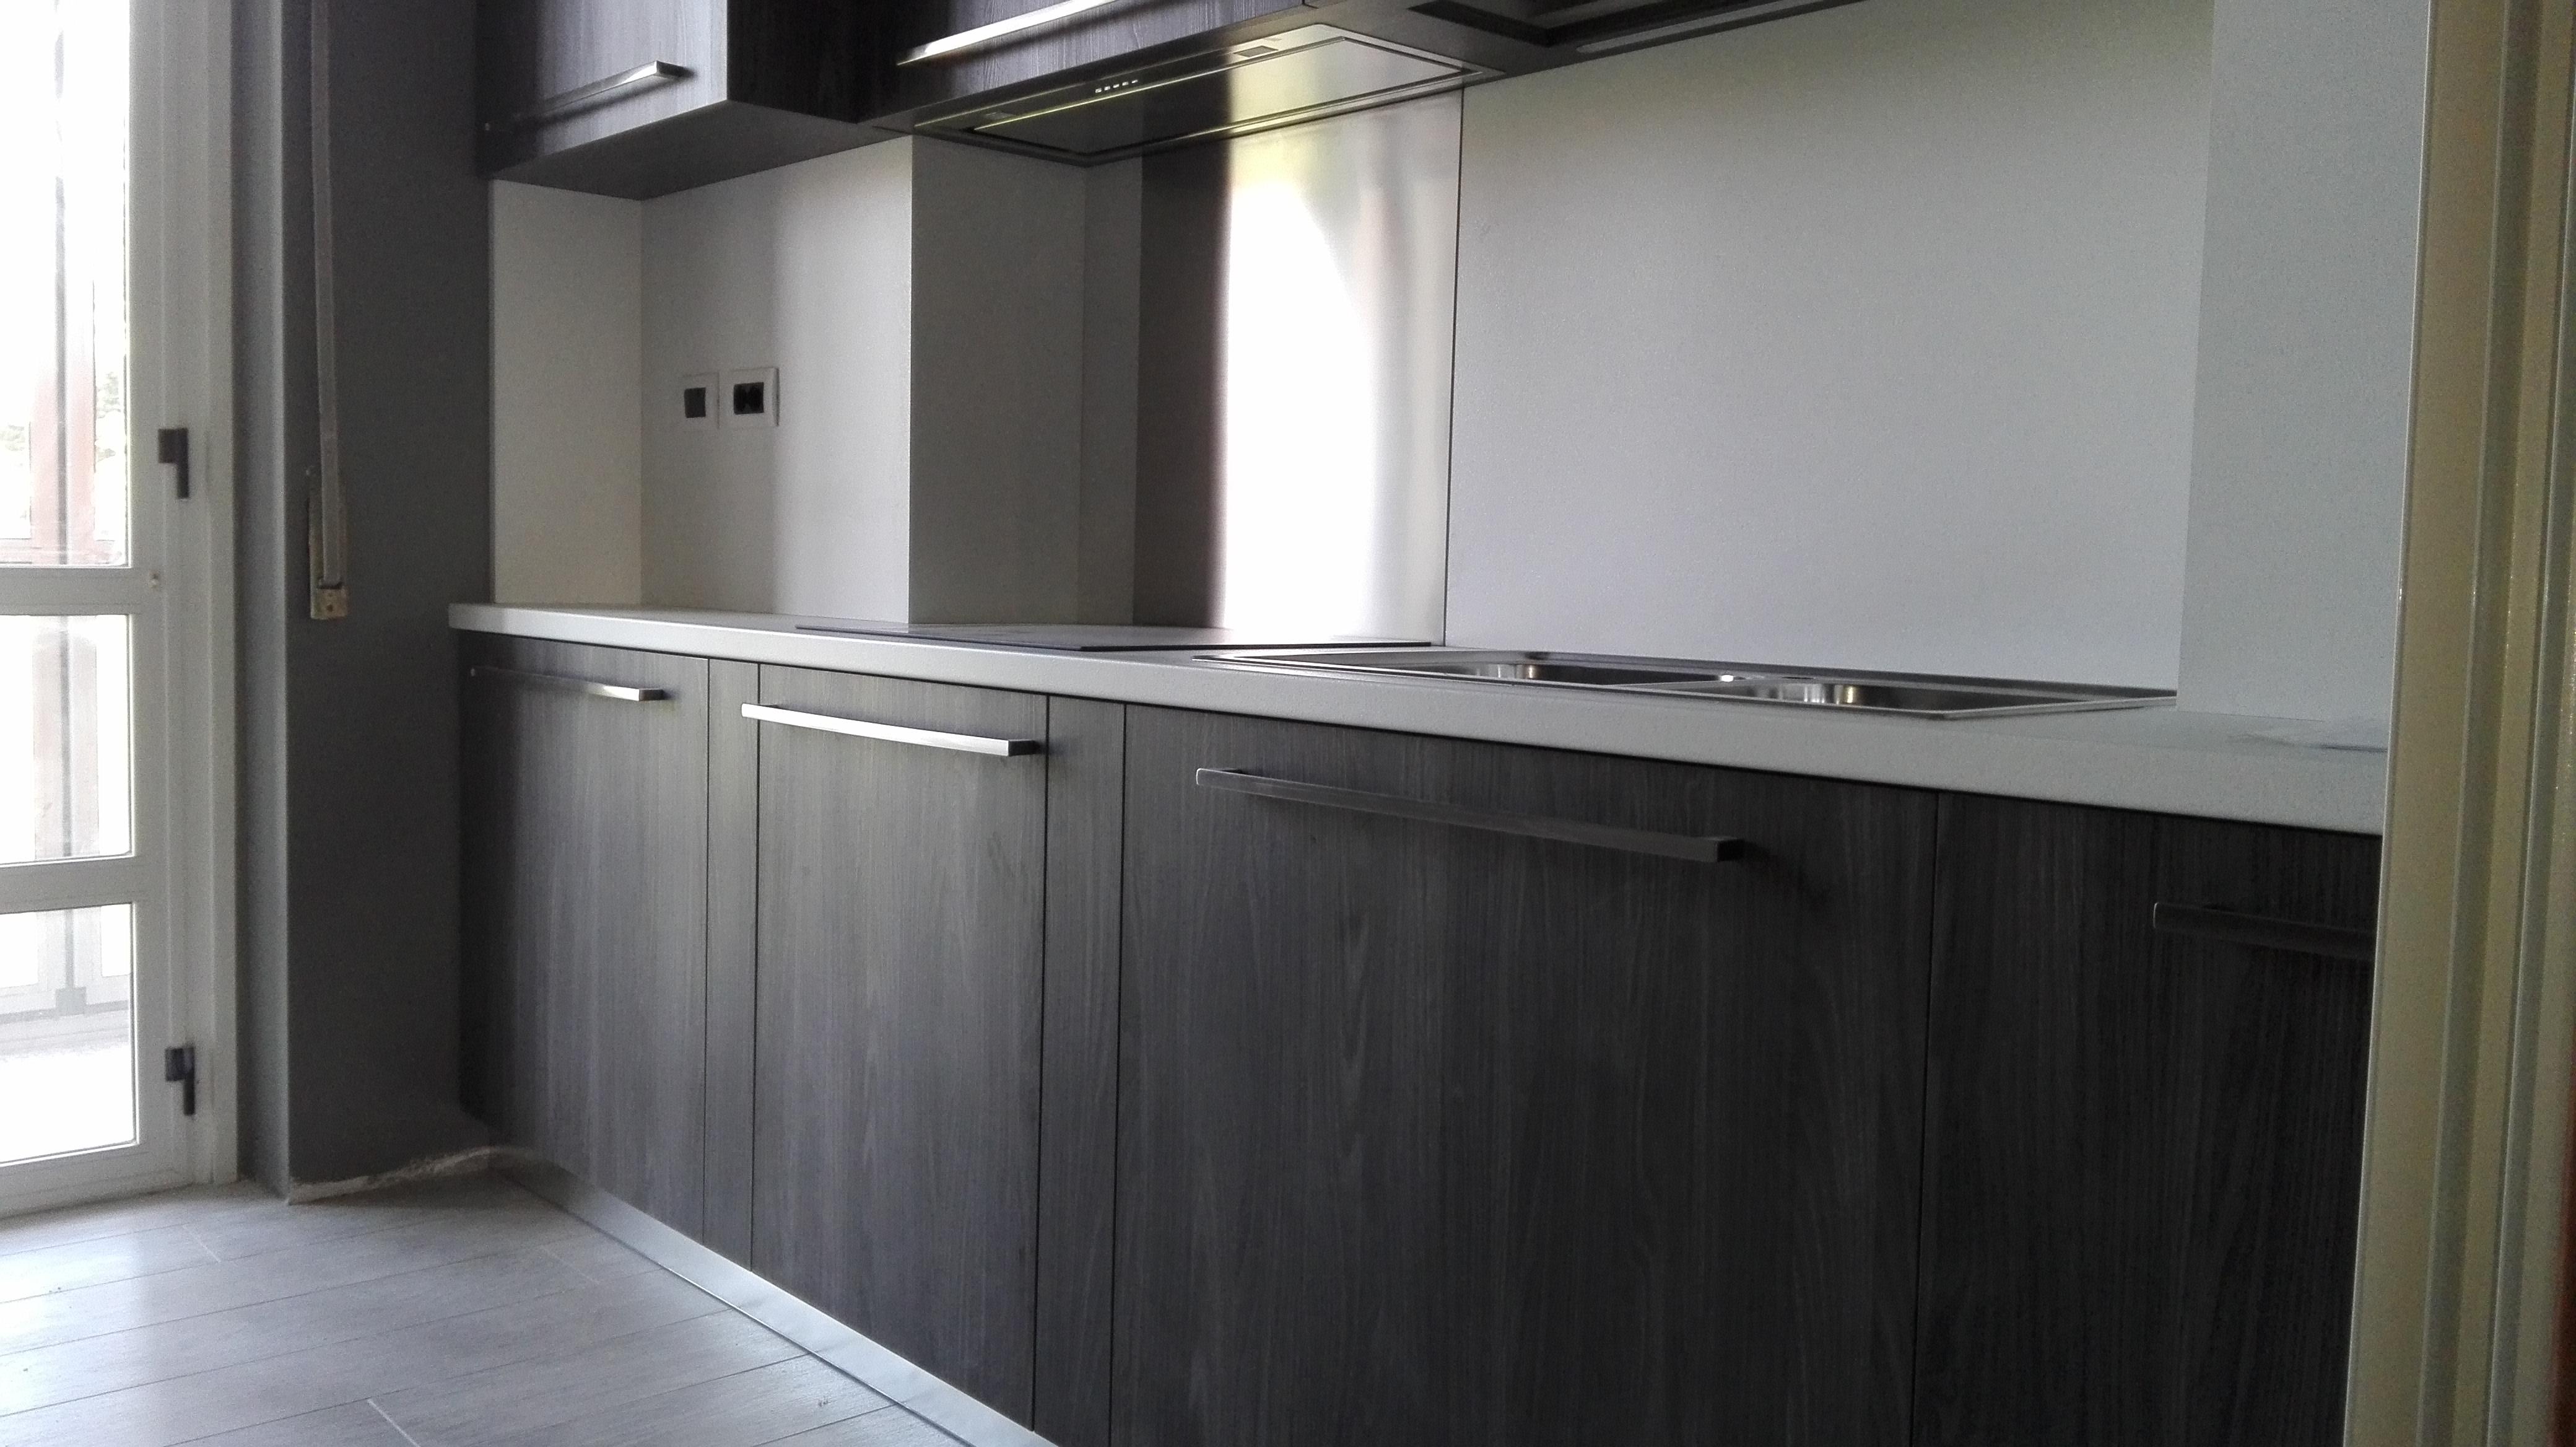 Cucina falegnameria legno arredo milano - Cucina molecolare milano ...